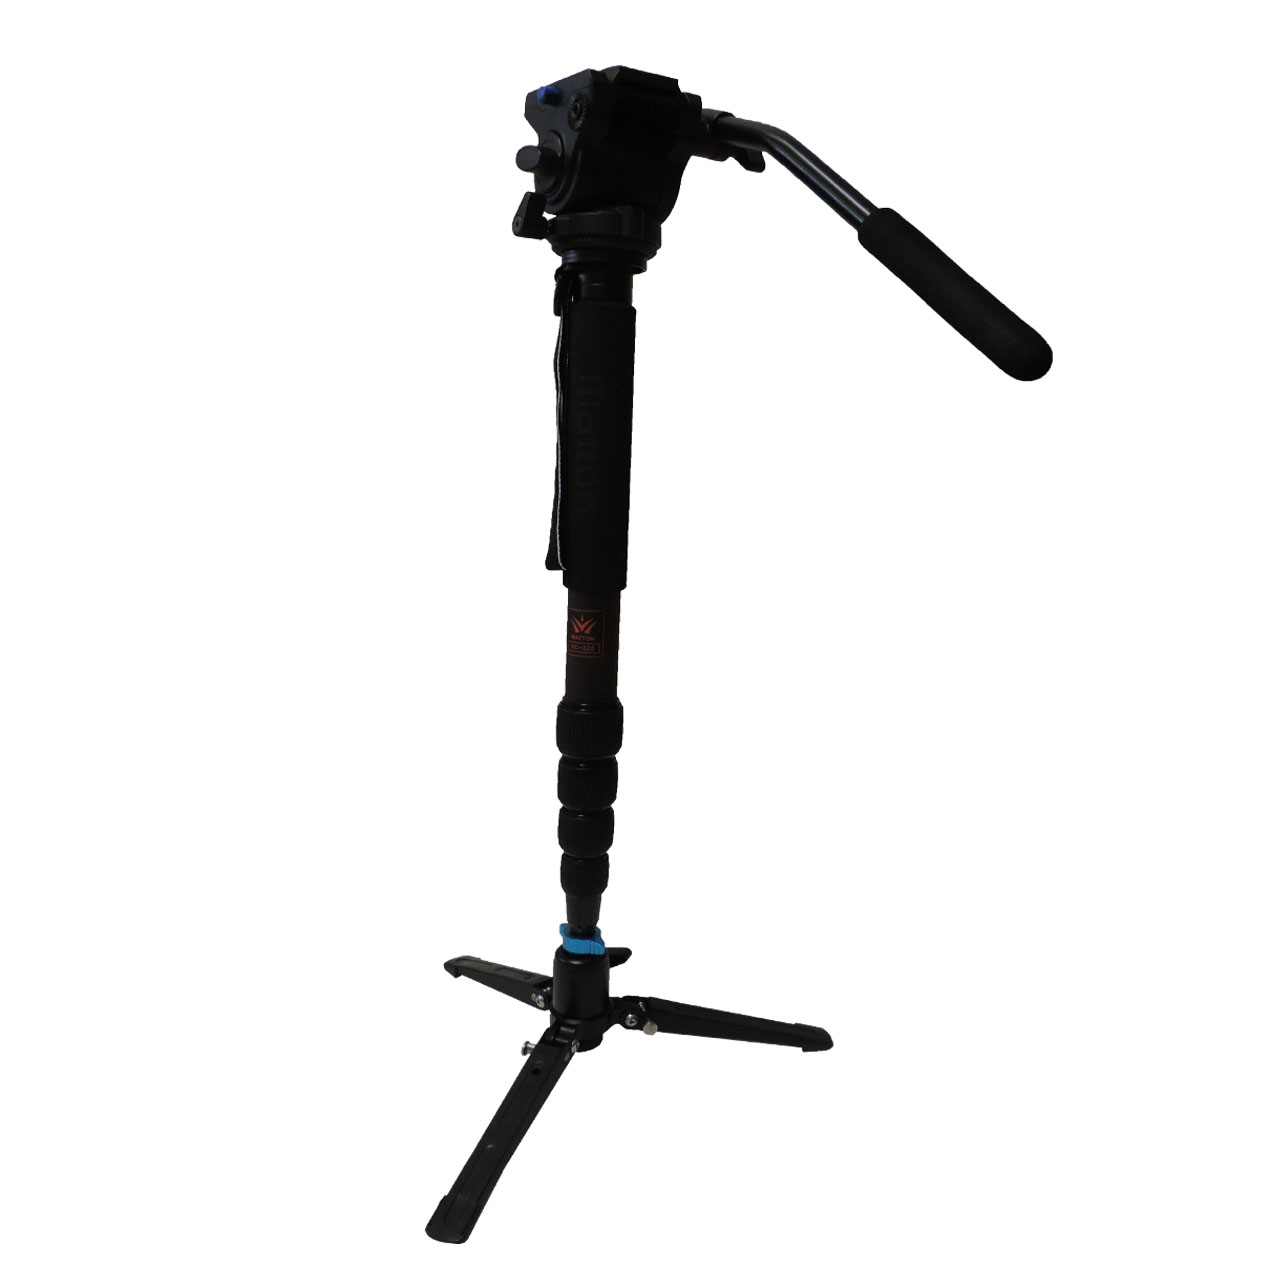 تک پایه دوربین مدل VC-325+S20 کد 20